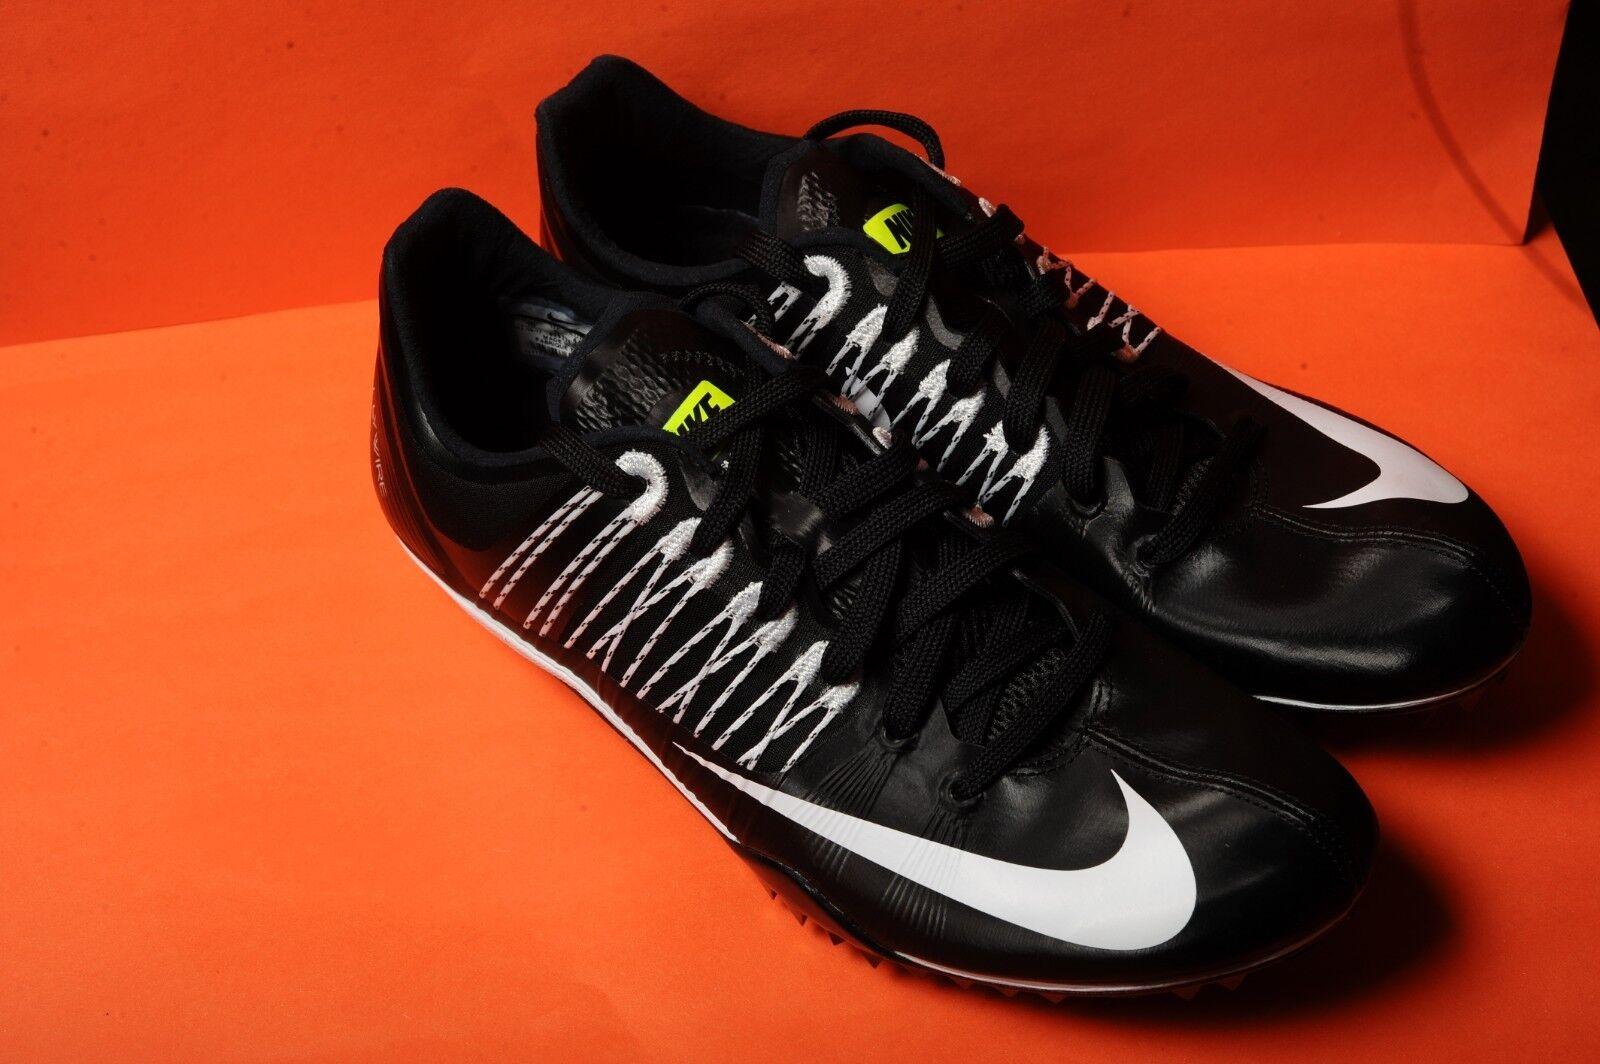 best loved 9573b 2fd94 Nuove Nike Zoom Celar 5 5 5 Punte Nero   Bianco   Volt Unisex Sz 10